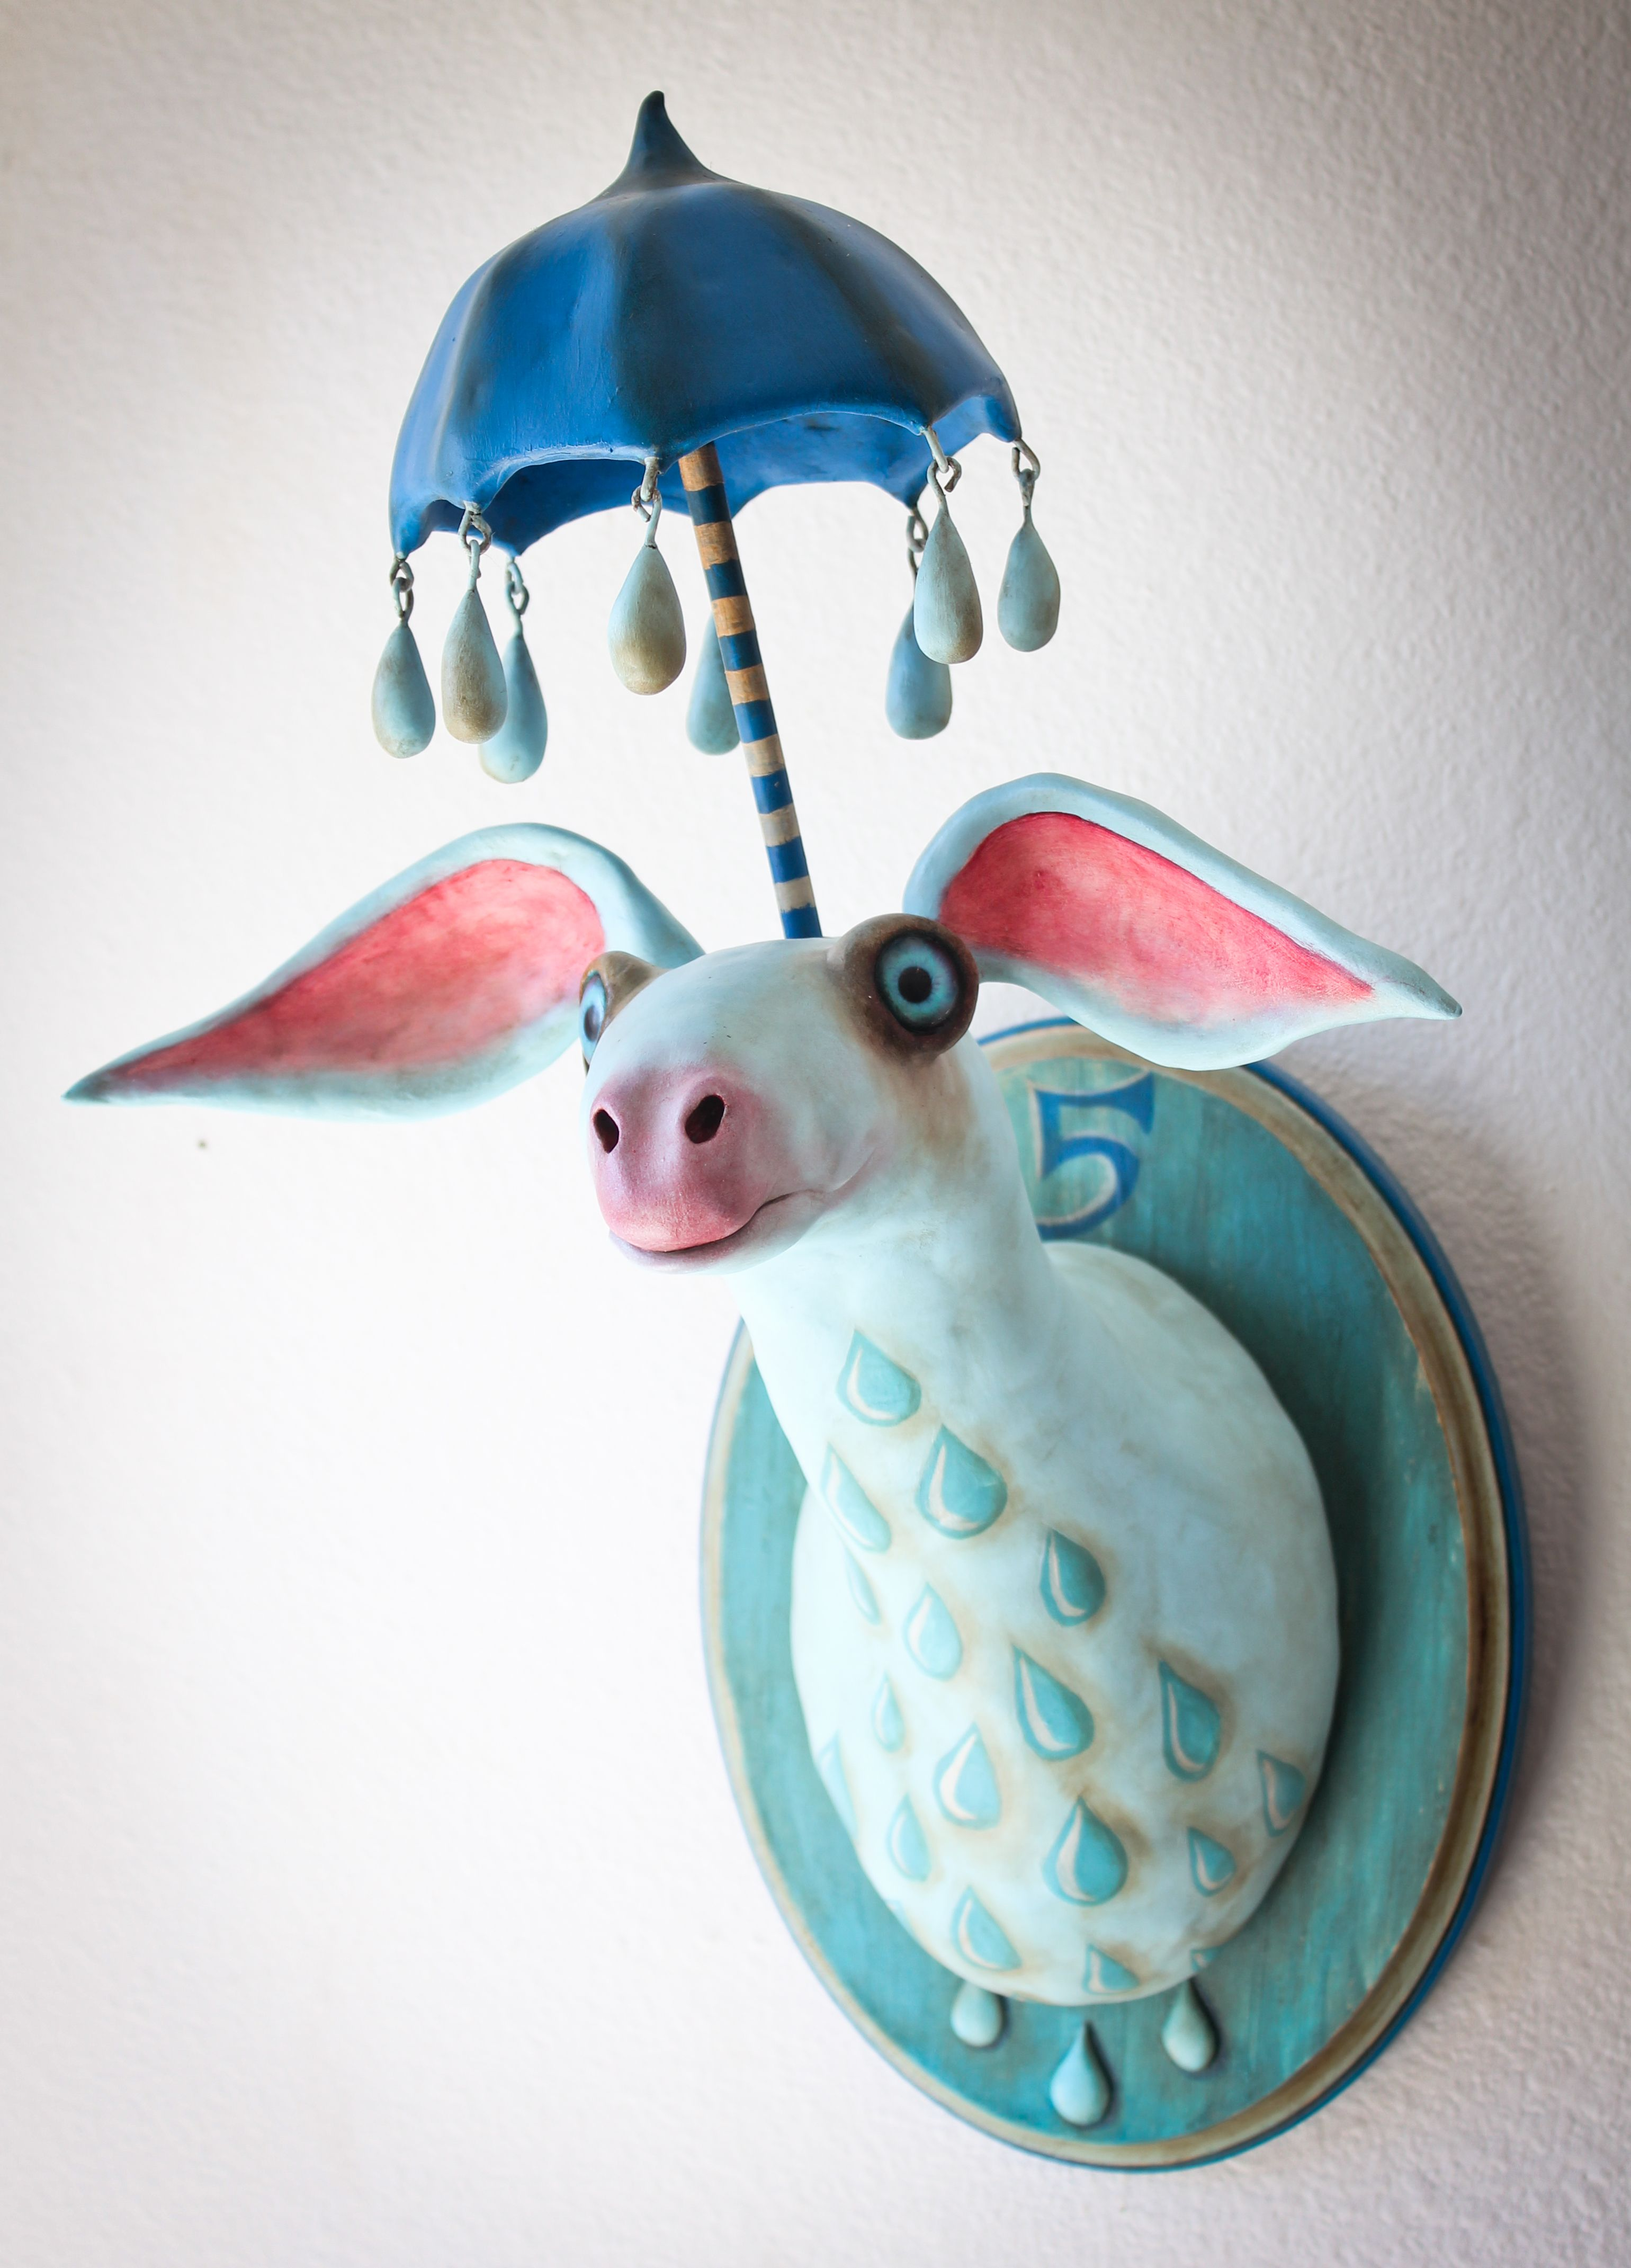 El Paraguas #5, by artist Valency Genis, Wood, wire, epoxy clay ...